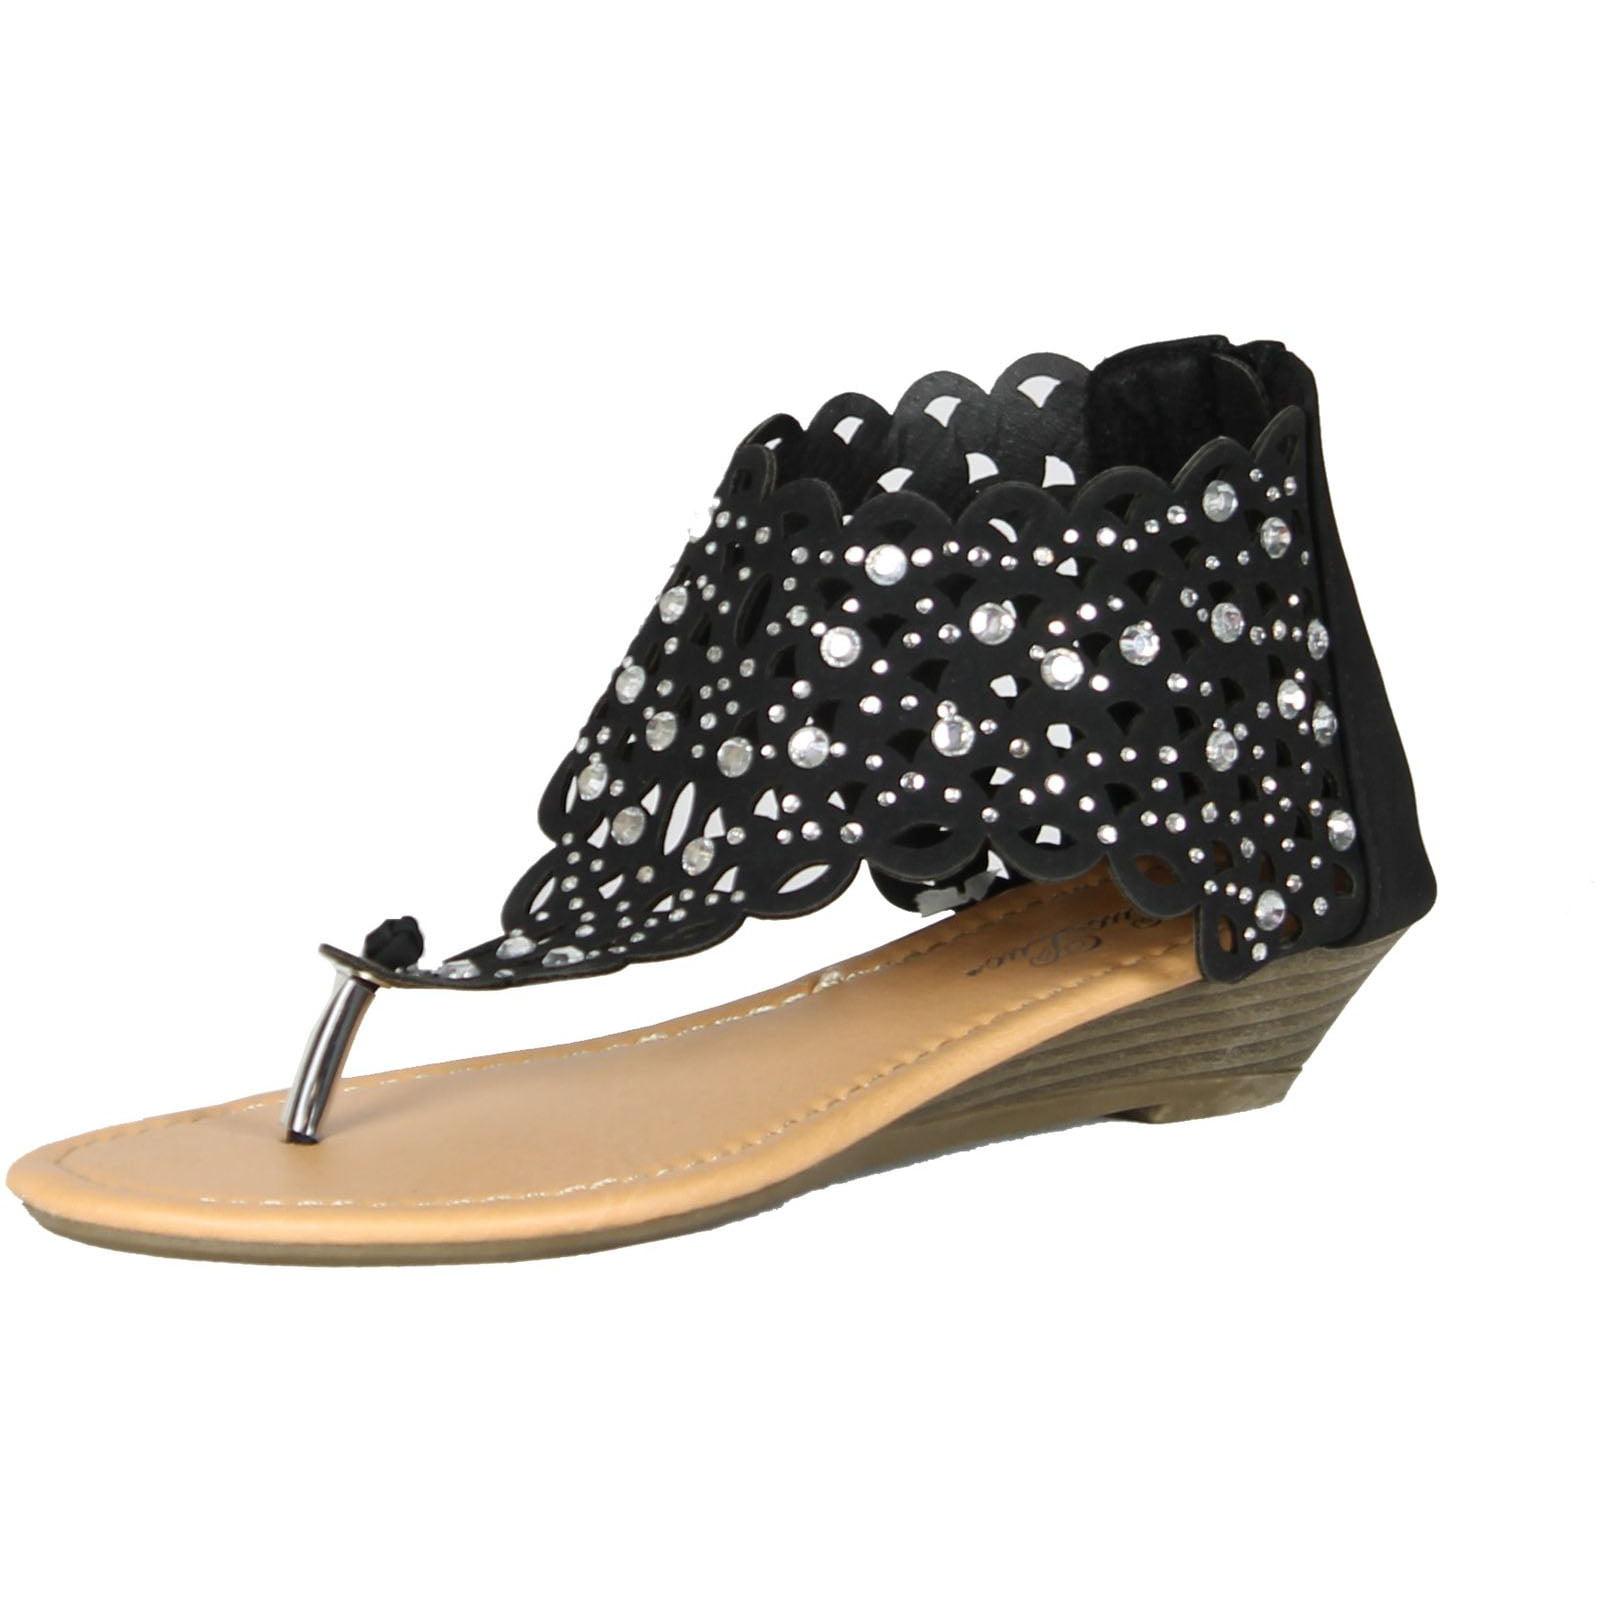 30b2c5a40 Luo Luo - Womens Gladiator Sandals Wedge Heel Thongs Dressy Ankle Wrap  Shoes W Rhinestone - Walmart.com